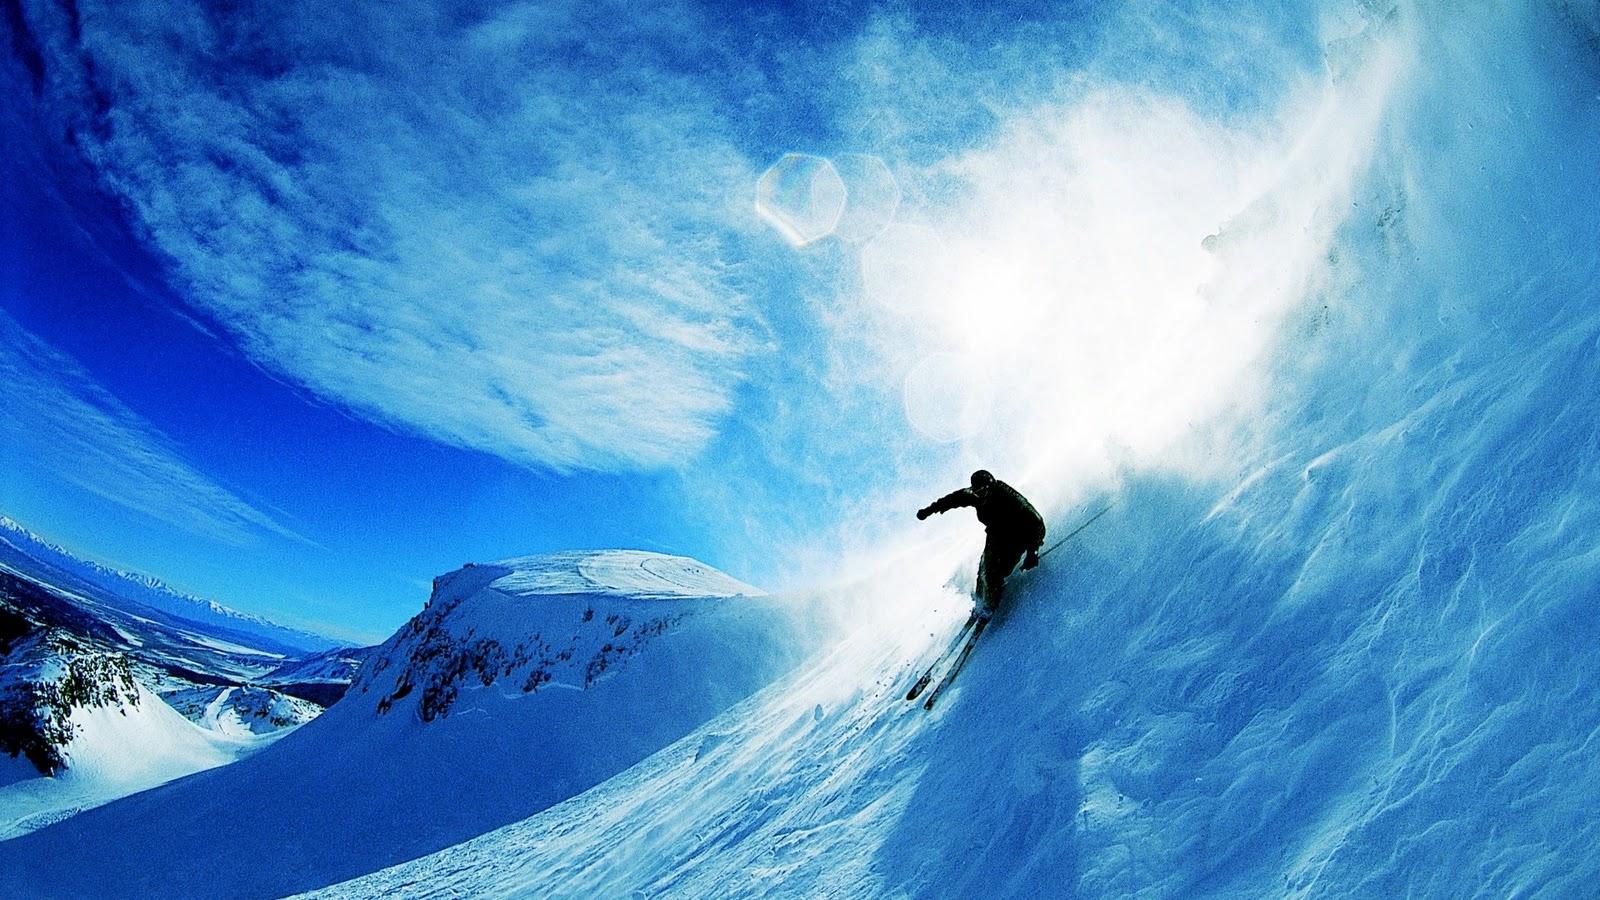 Free Download Snowboarding Wallpapers Hd Wallpapers Desktop Wallapers High 1600x900 For Your Desktop Mobile Tablet Explore 73 Snowboarding Wallpaper Hd Burton Snowboard Wallpaper Snowboarding Wallpapers For Desktop